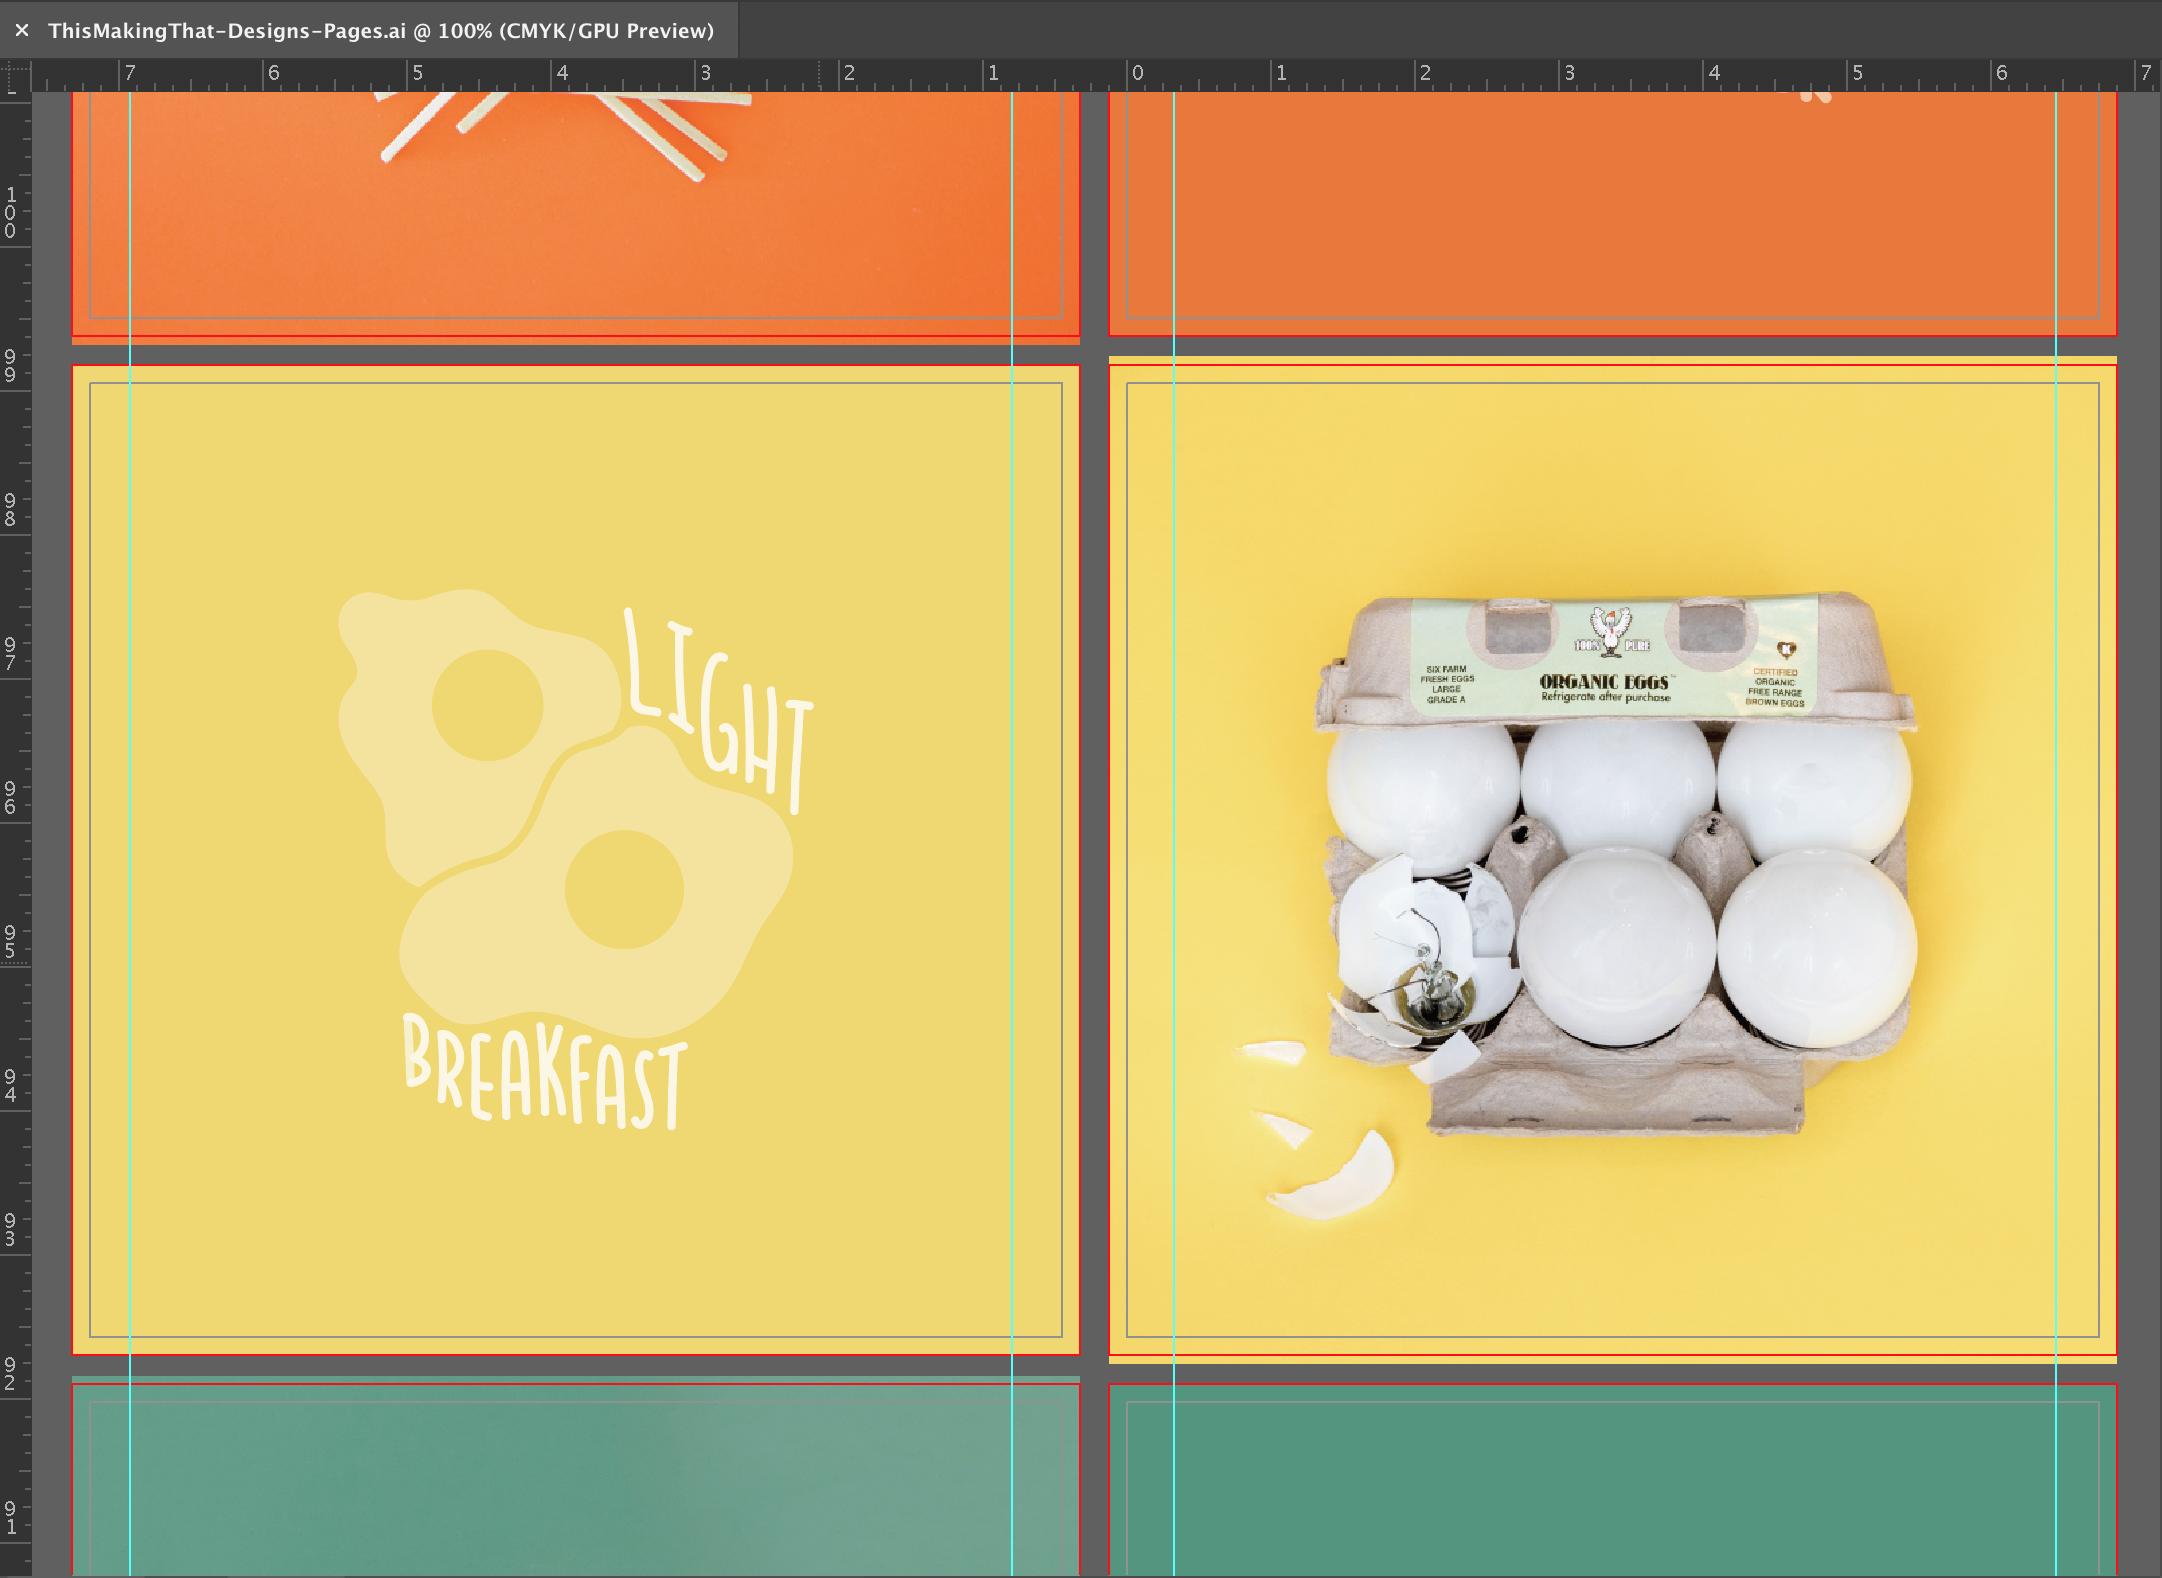 LightBreakfast-3.png